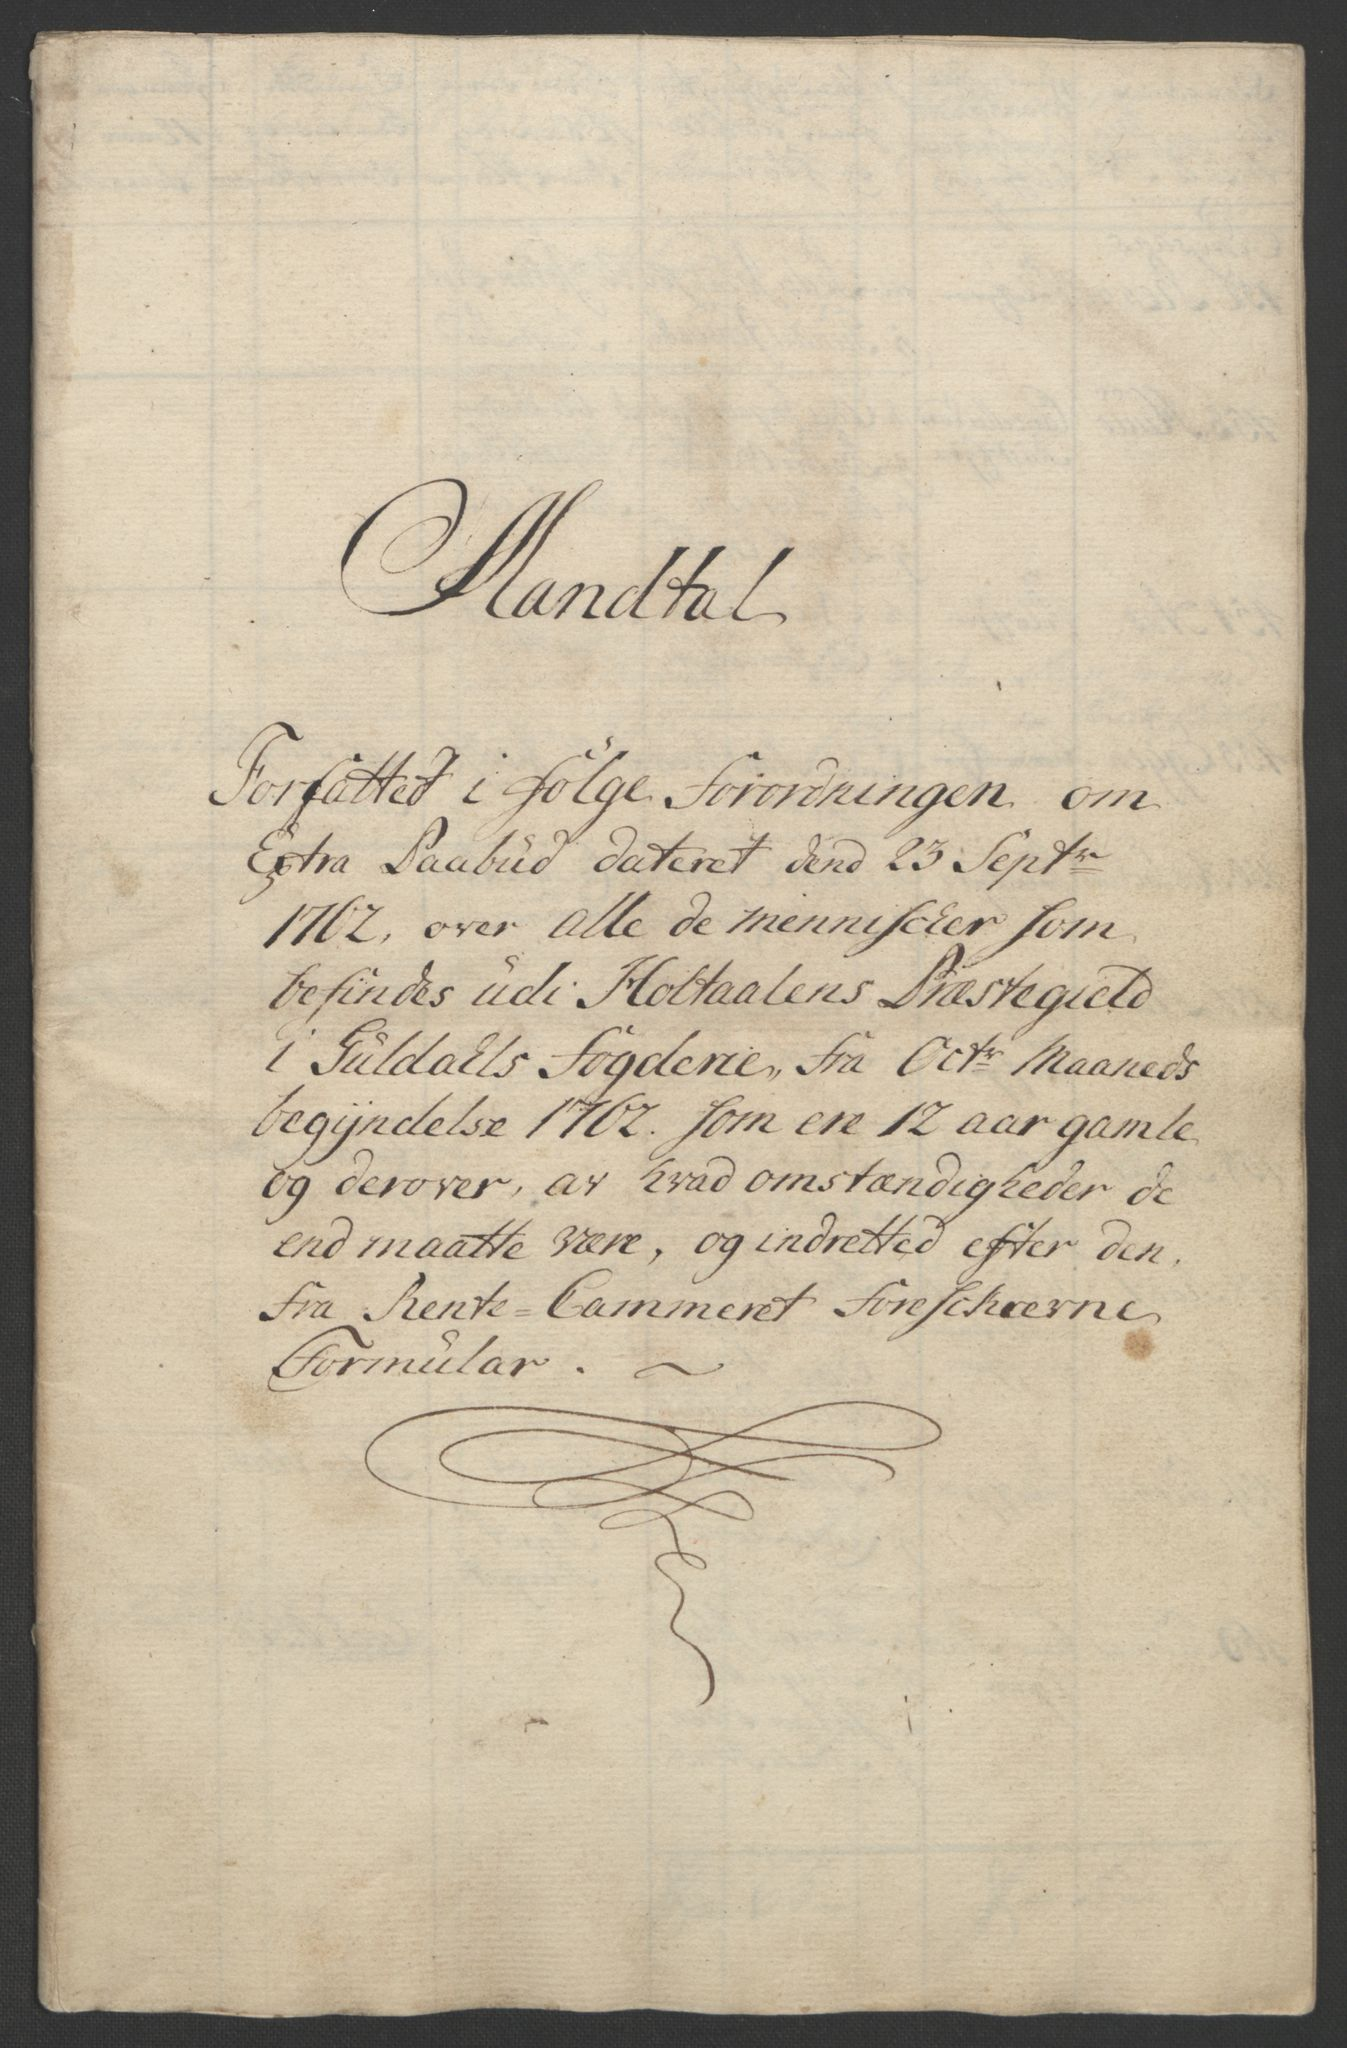 RA, Rentekammeret inntil 1814, Realistisk ordnet avdeling, Ol/L0021: [Gg 10]: Ekstraskatten, 23.09.1762. Orkdal og Gauldal, 1762-1767, s. 143